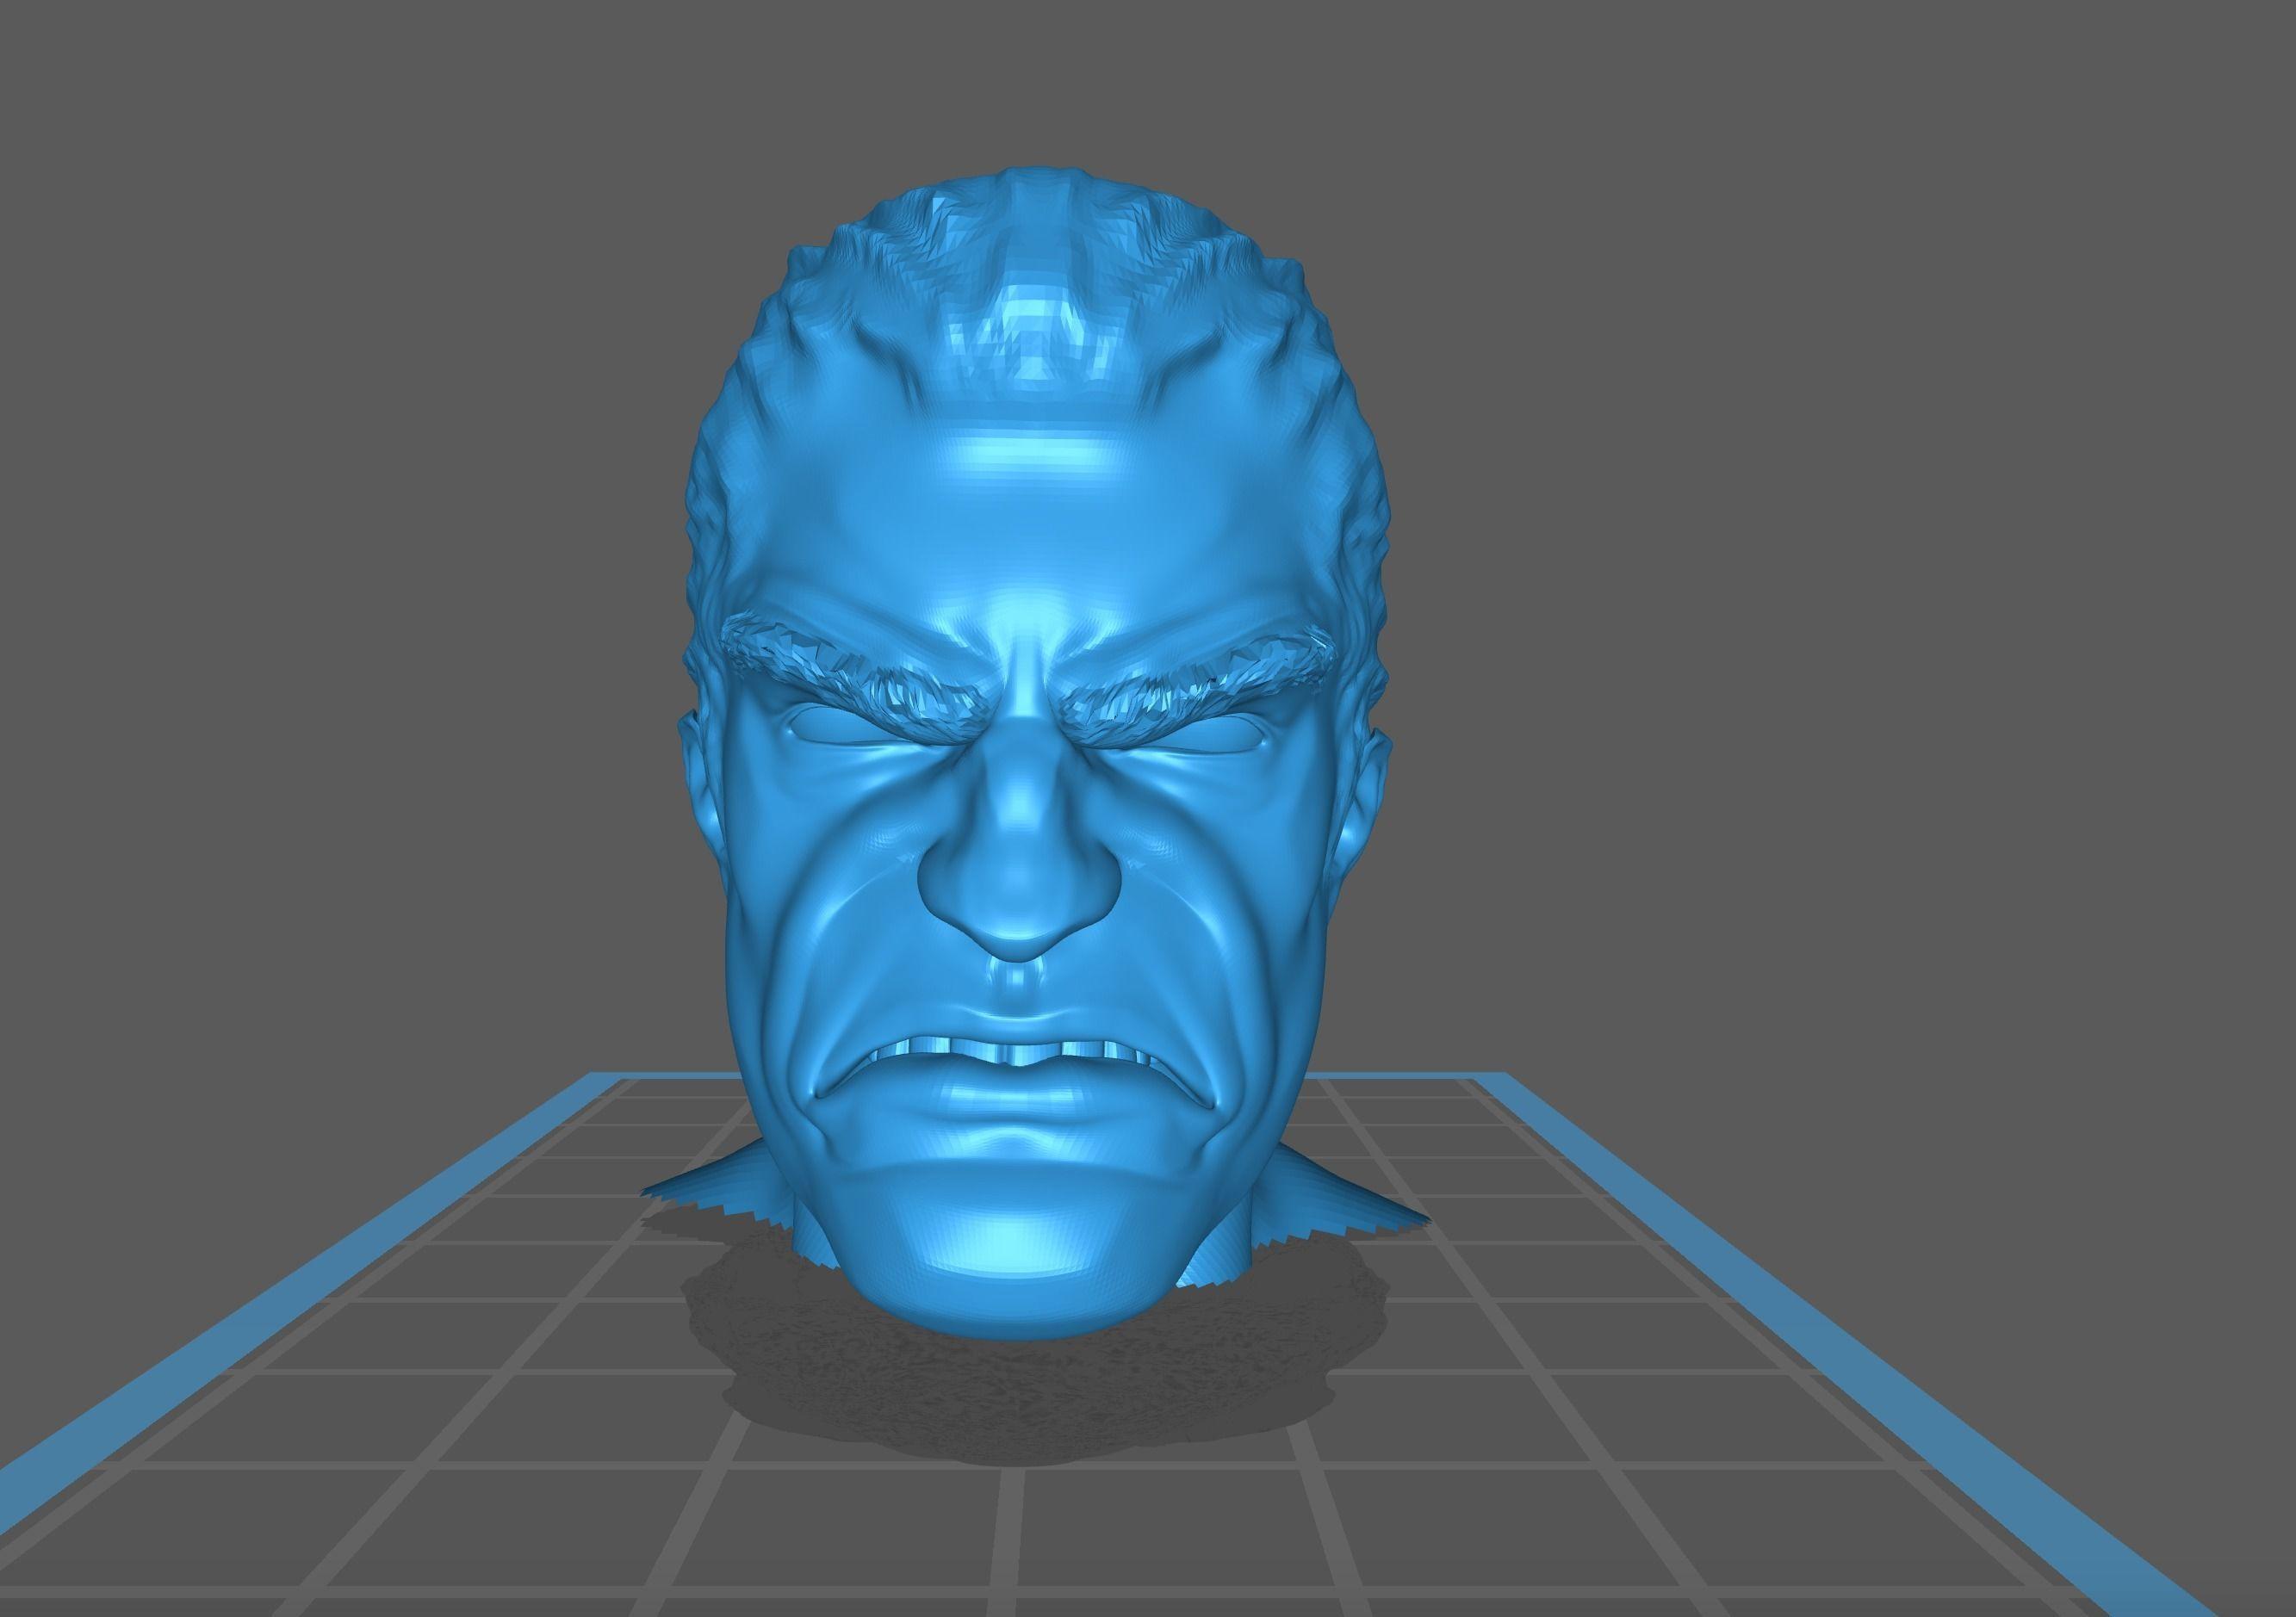 Punisher Head MCOC